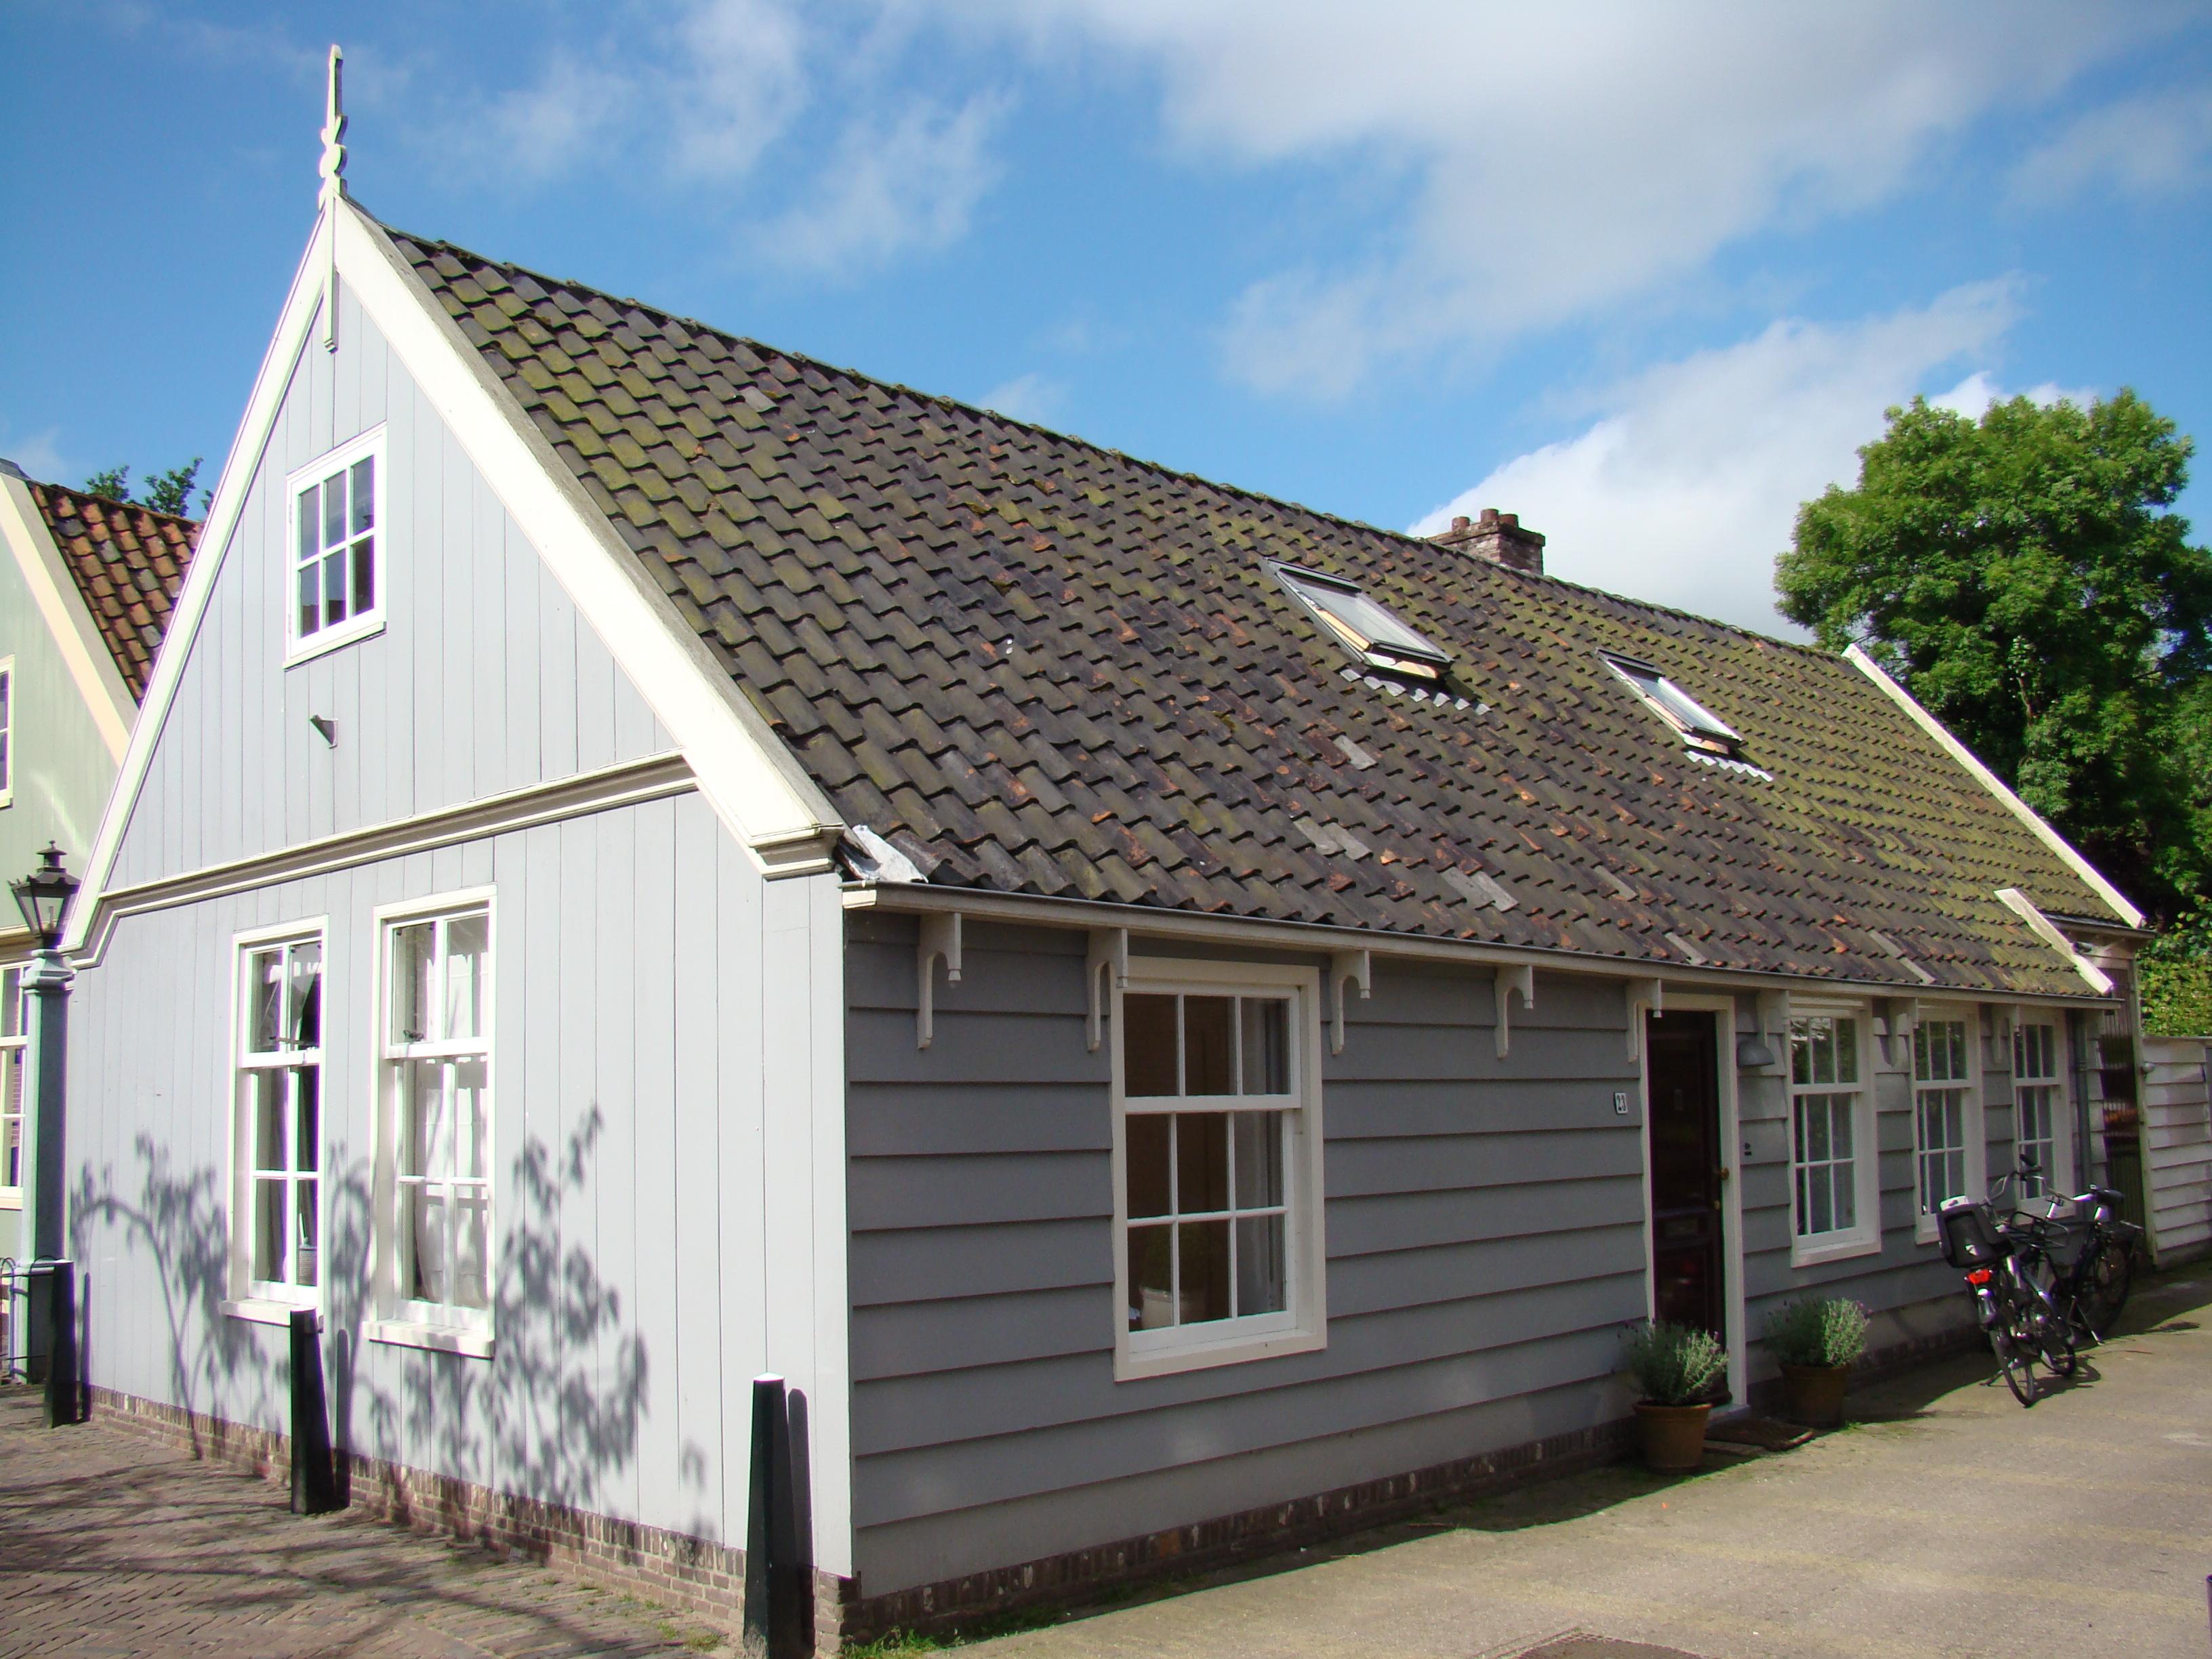 Houten huis in broek in waterland monument for Hout huis